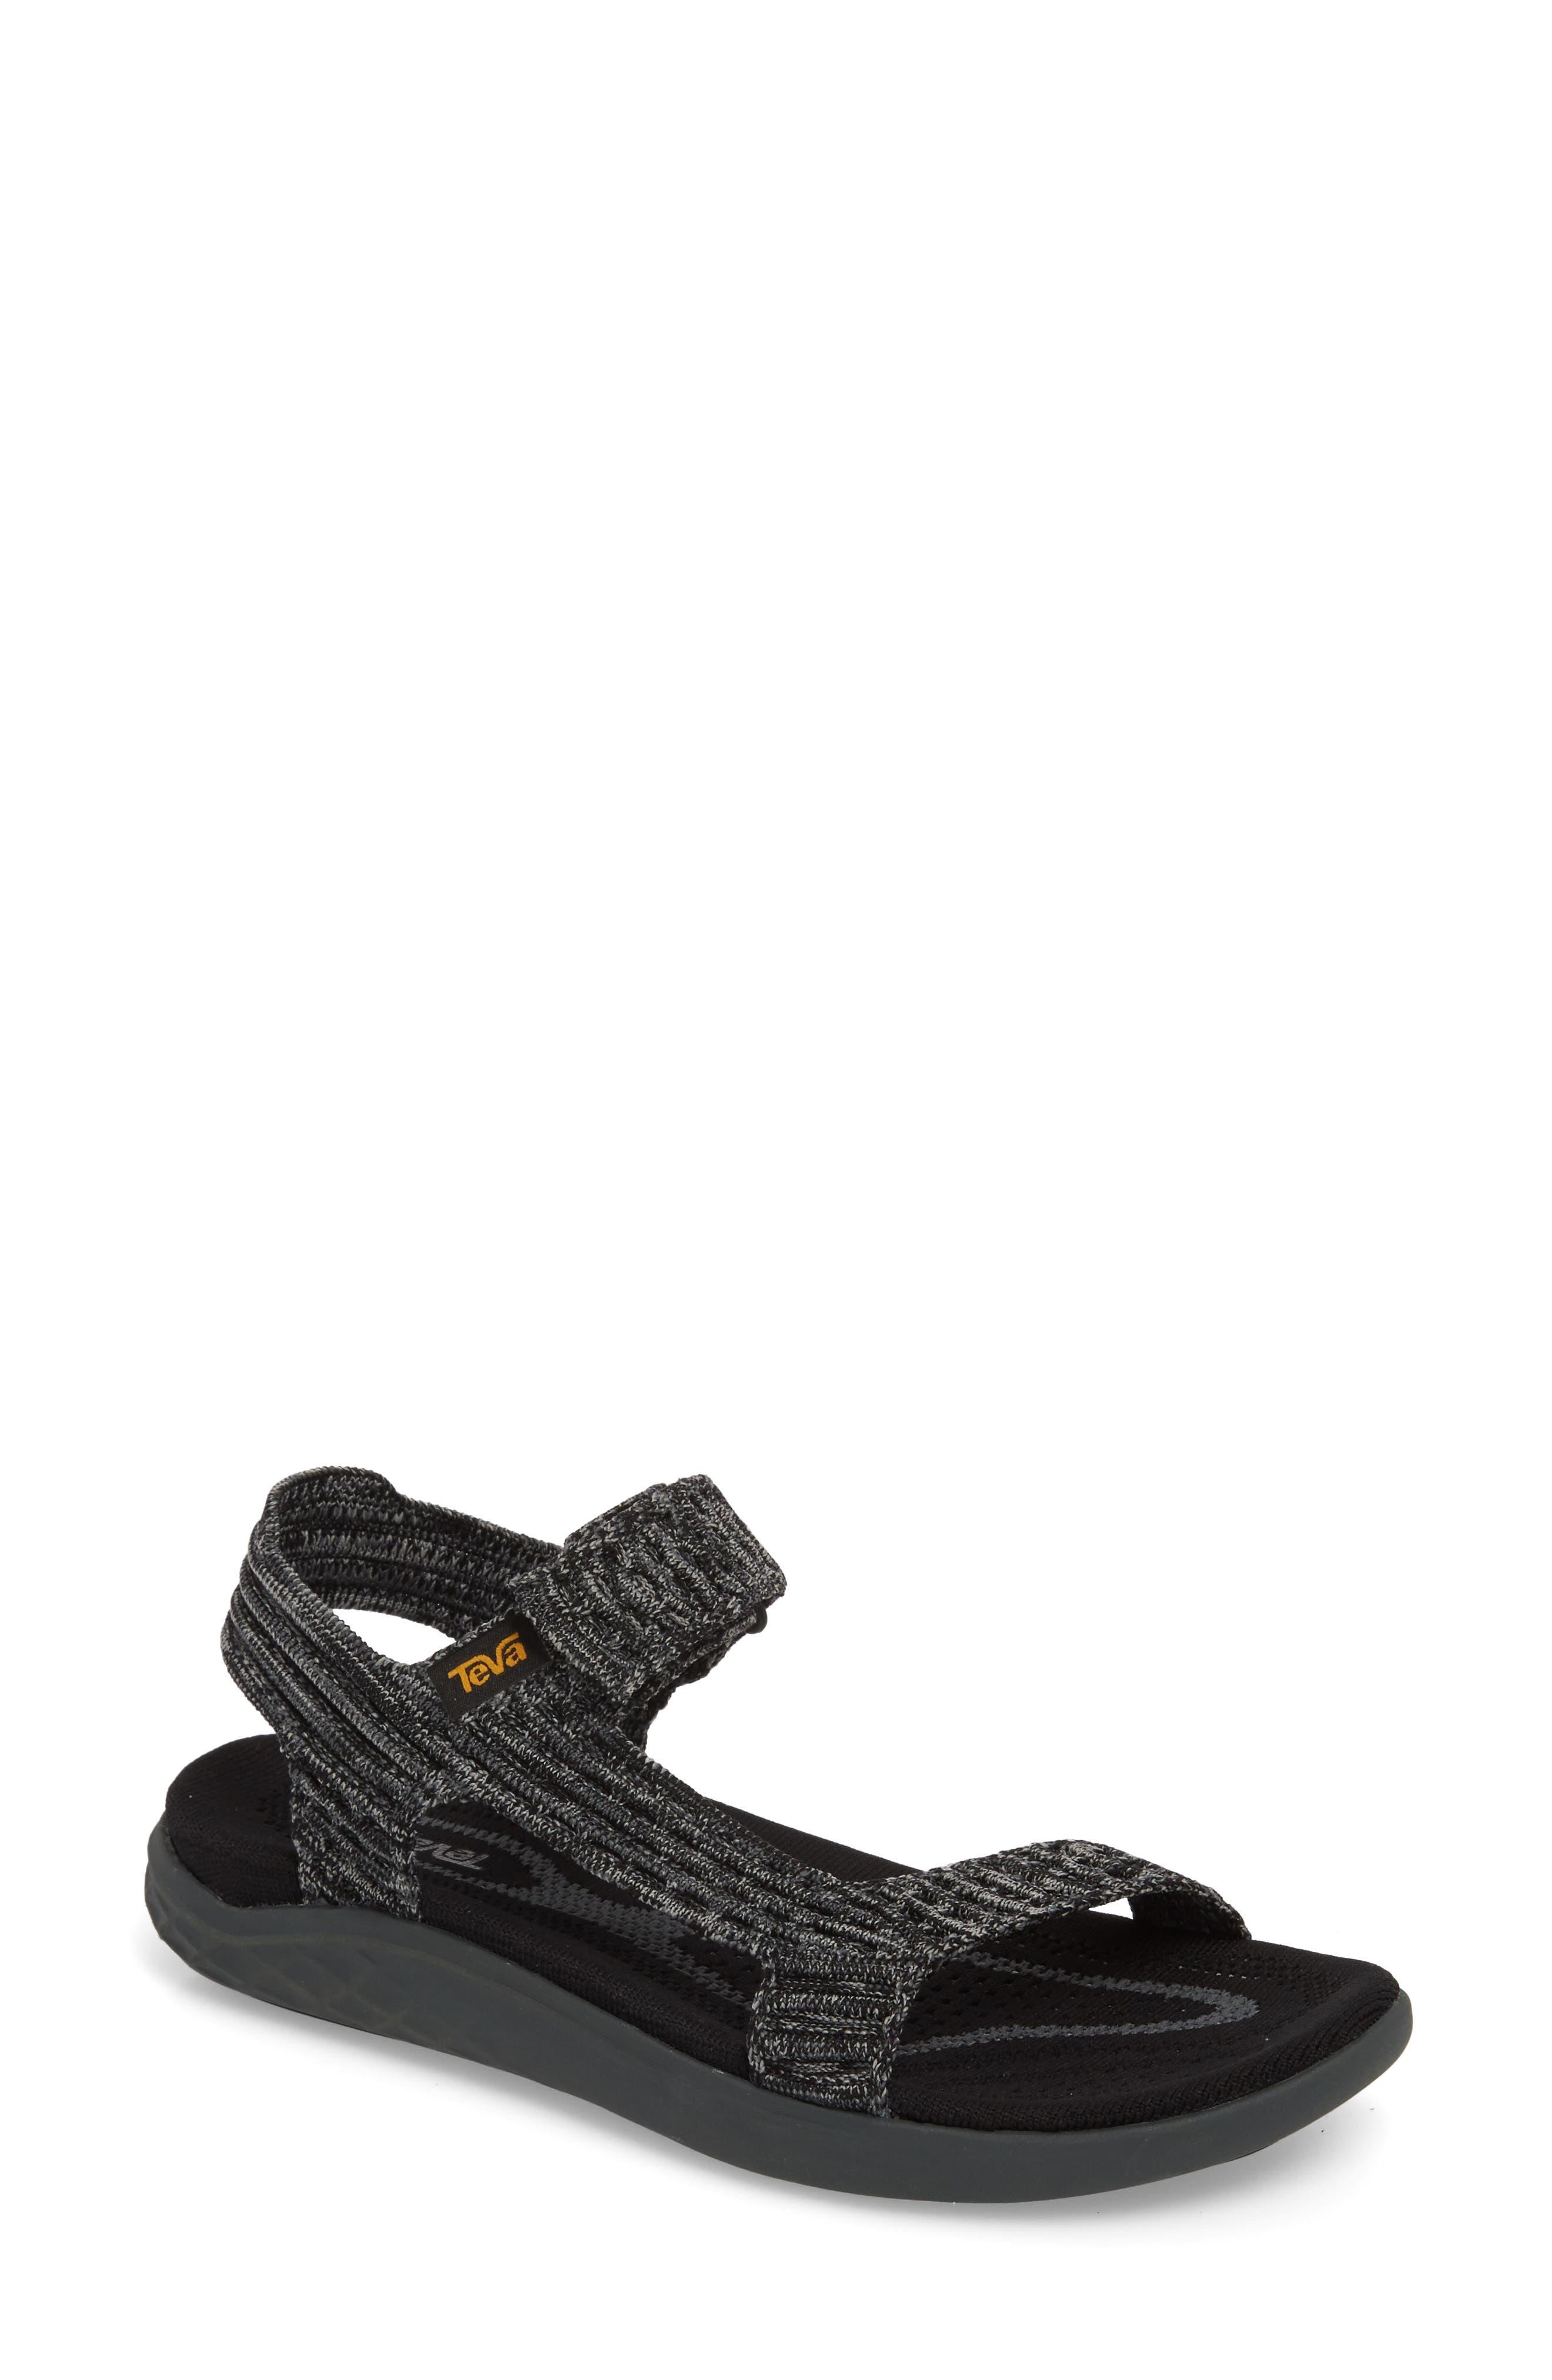 Terra Float 2 Knit Universal Sandal,                         Main,                         color,